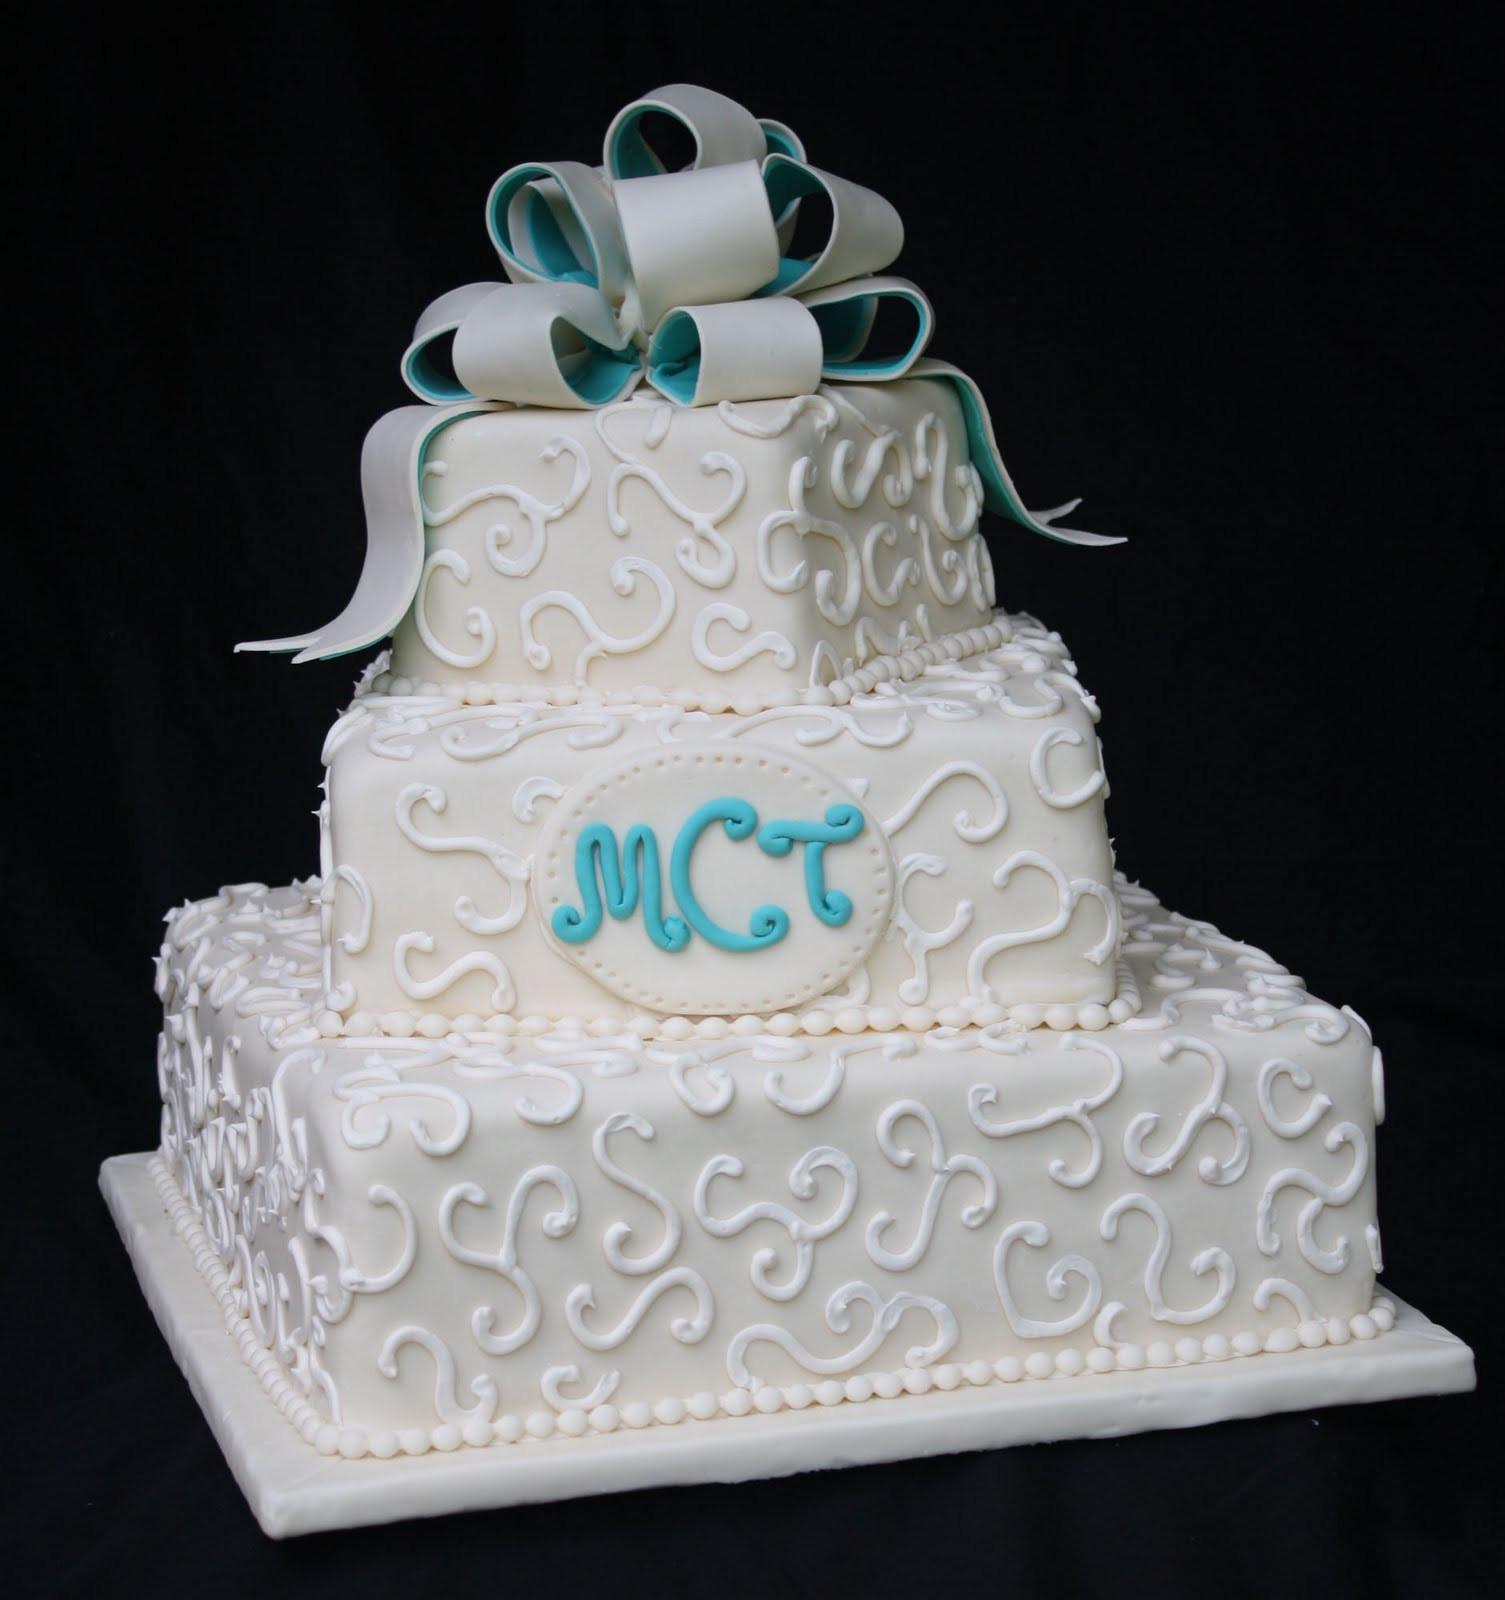 Wedding Cakes Pics  Download wedding cakes idea in 2017